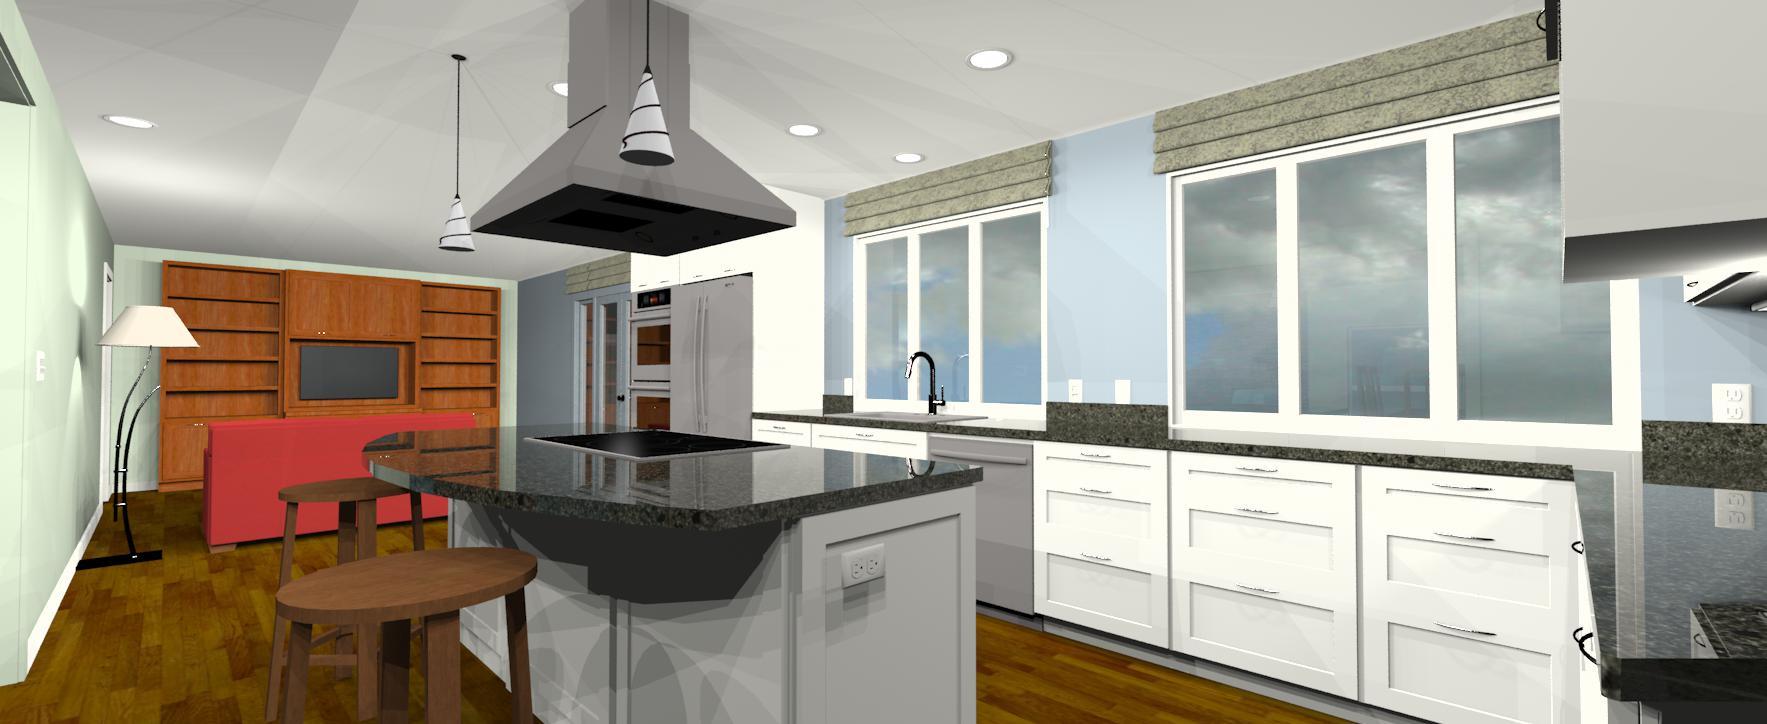 Art & Landscape Inspired Kitchen